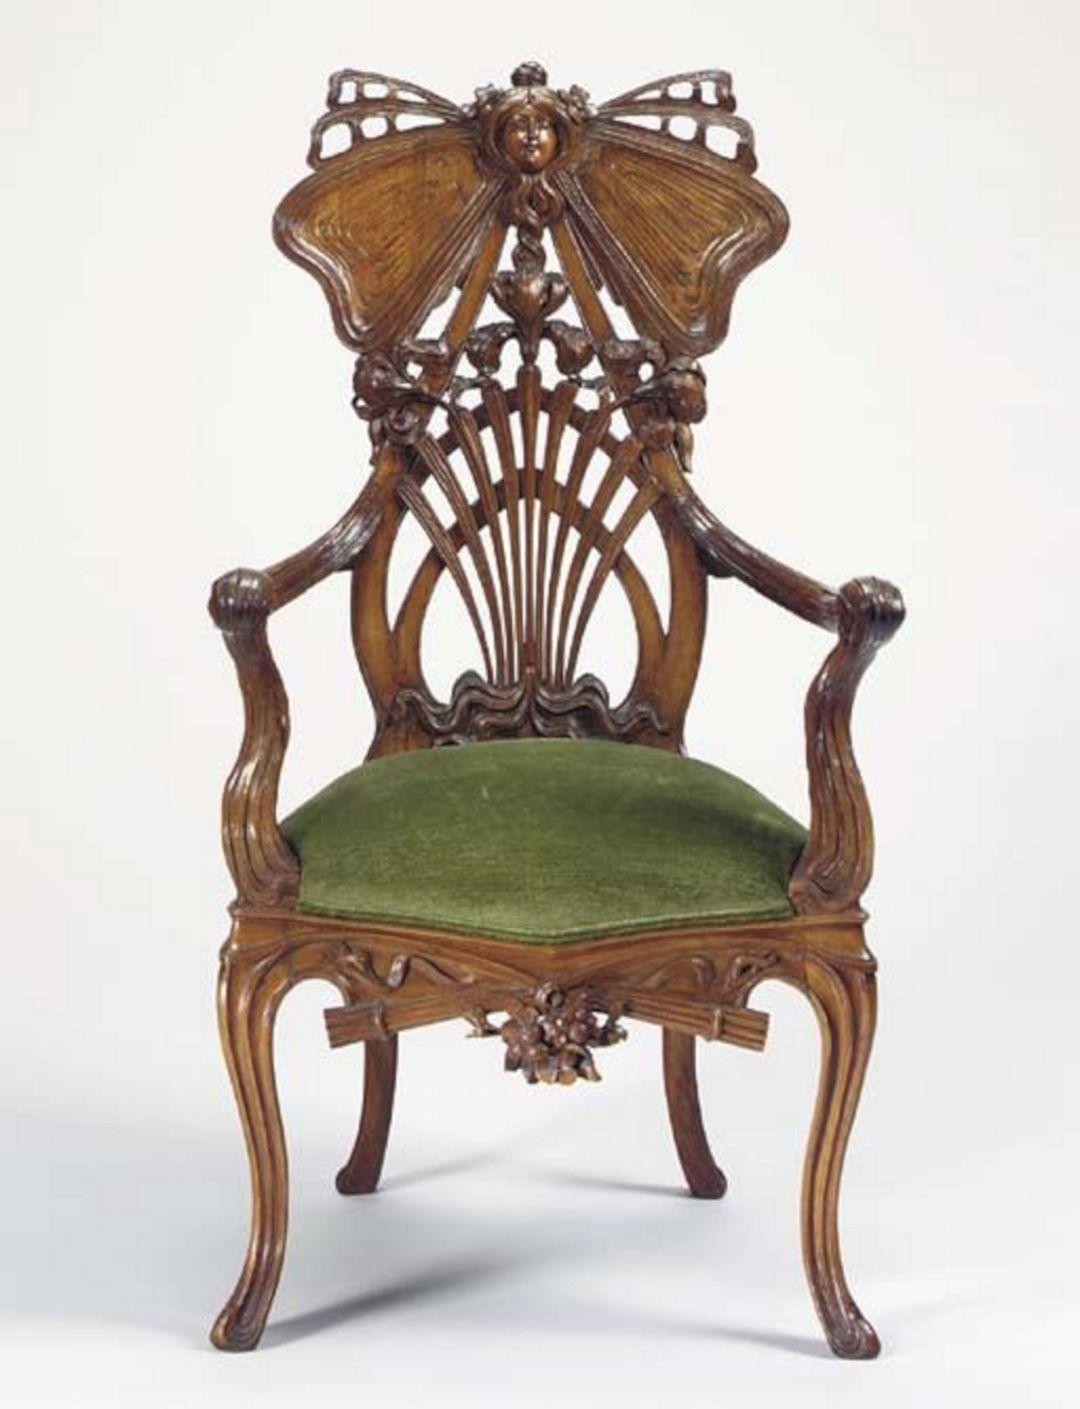 Best And Beautiful Antique Art Nouveau Furnitures: 50+ Best Inspiring / FresHOUZ.com